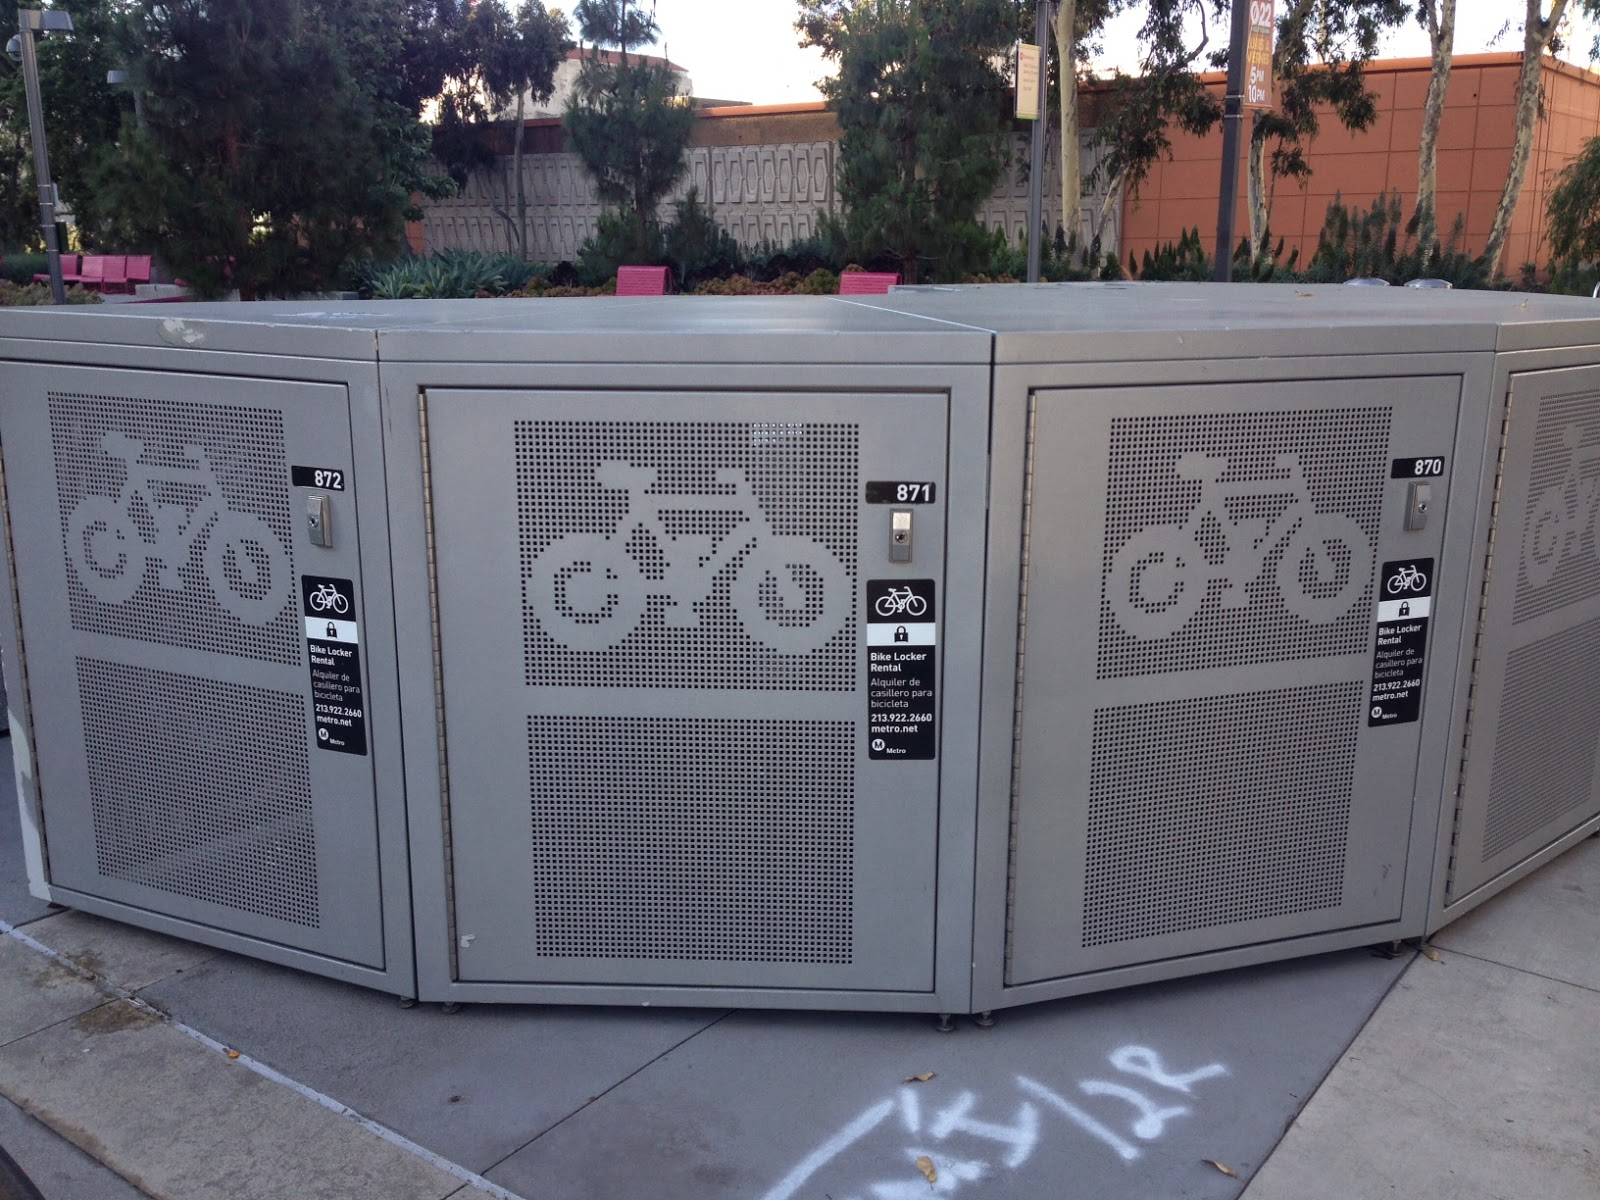 Metro Bike Locker i Also Saw Bike Lockers And